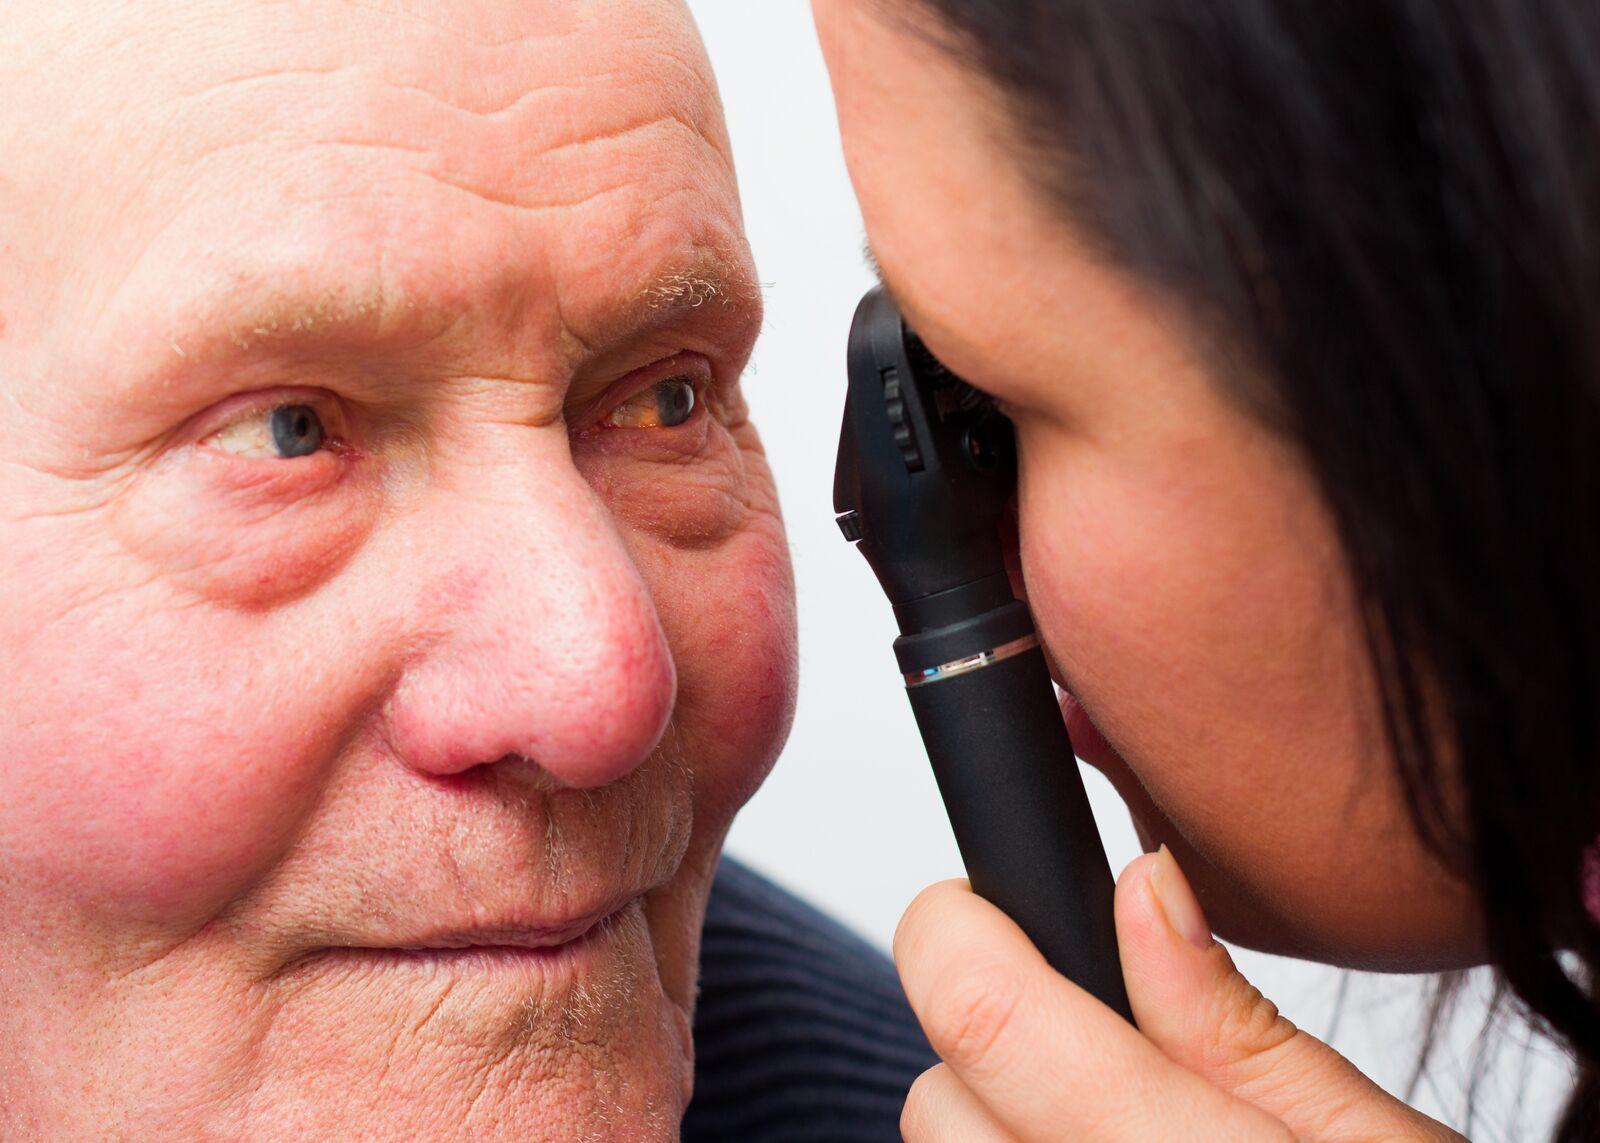 Home Health Care in Toluca Lake CA: Blindness